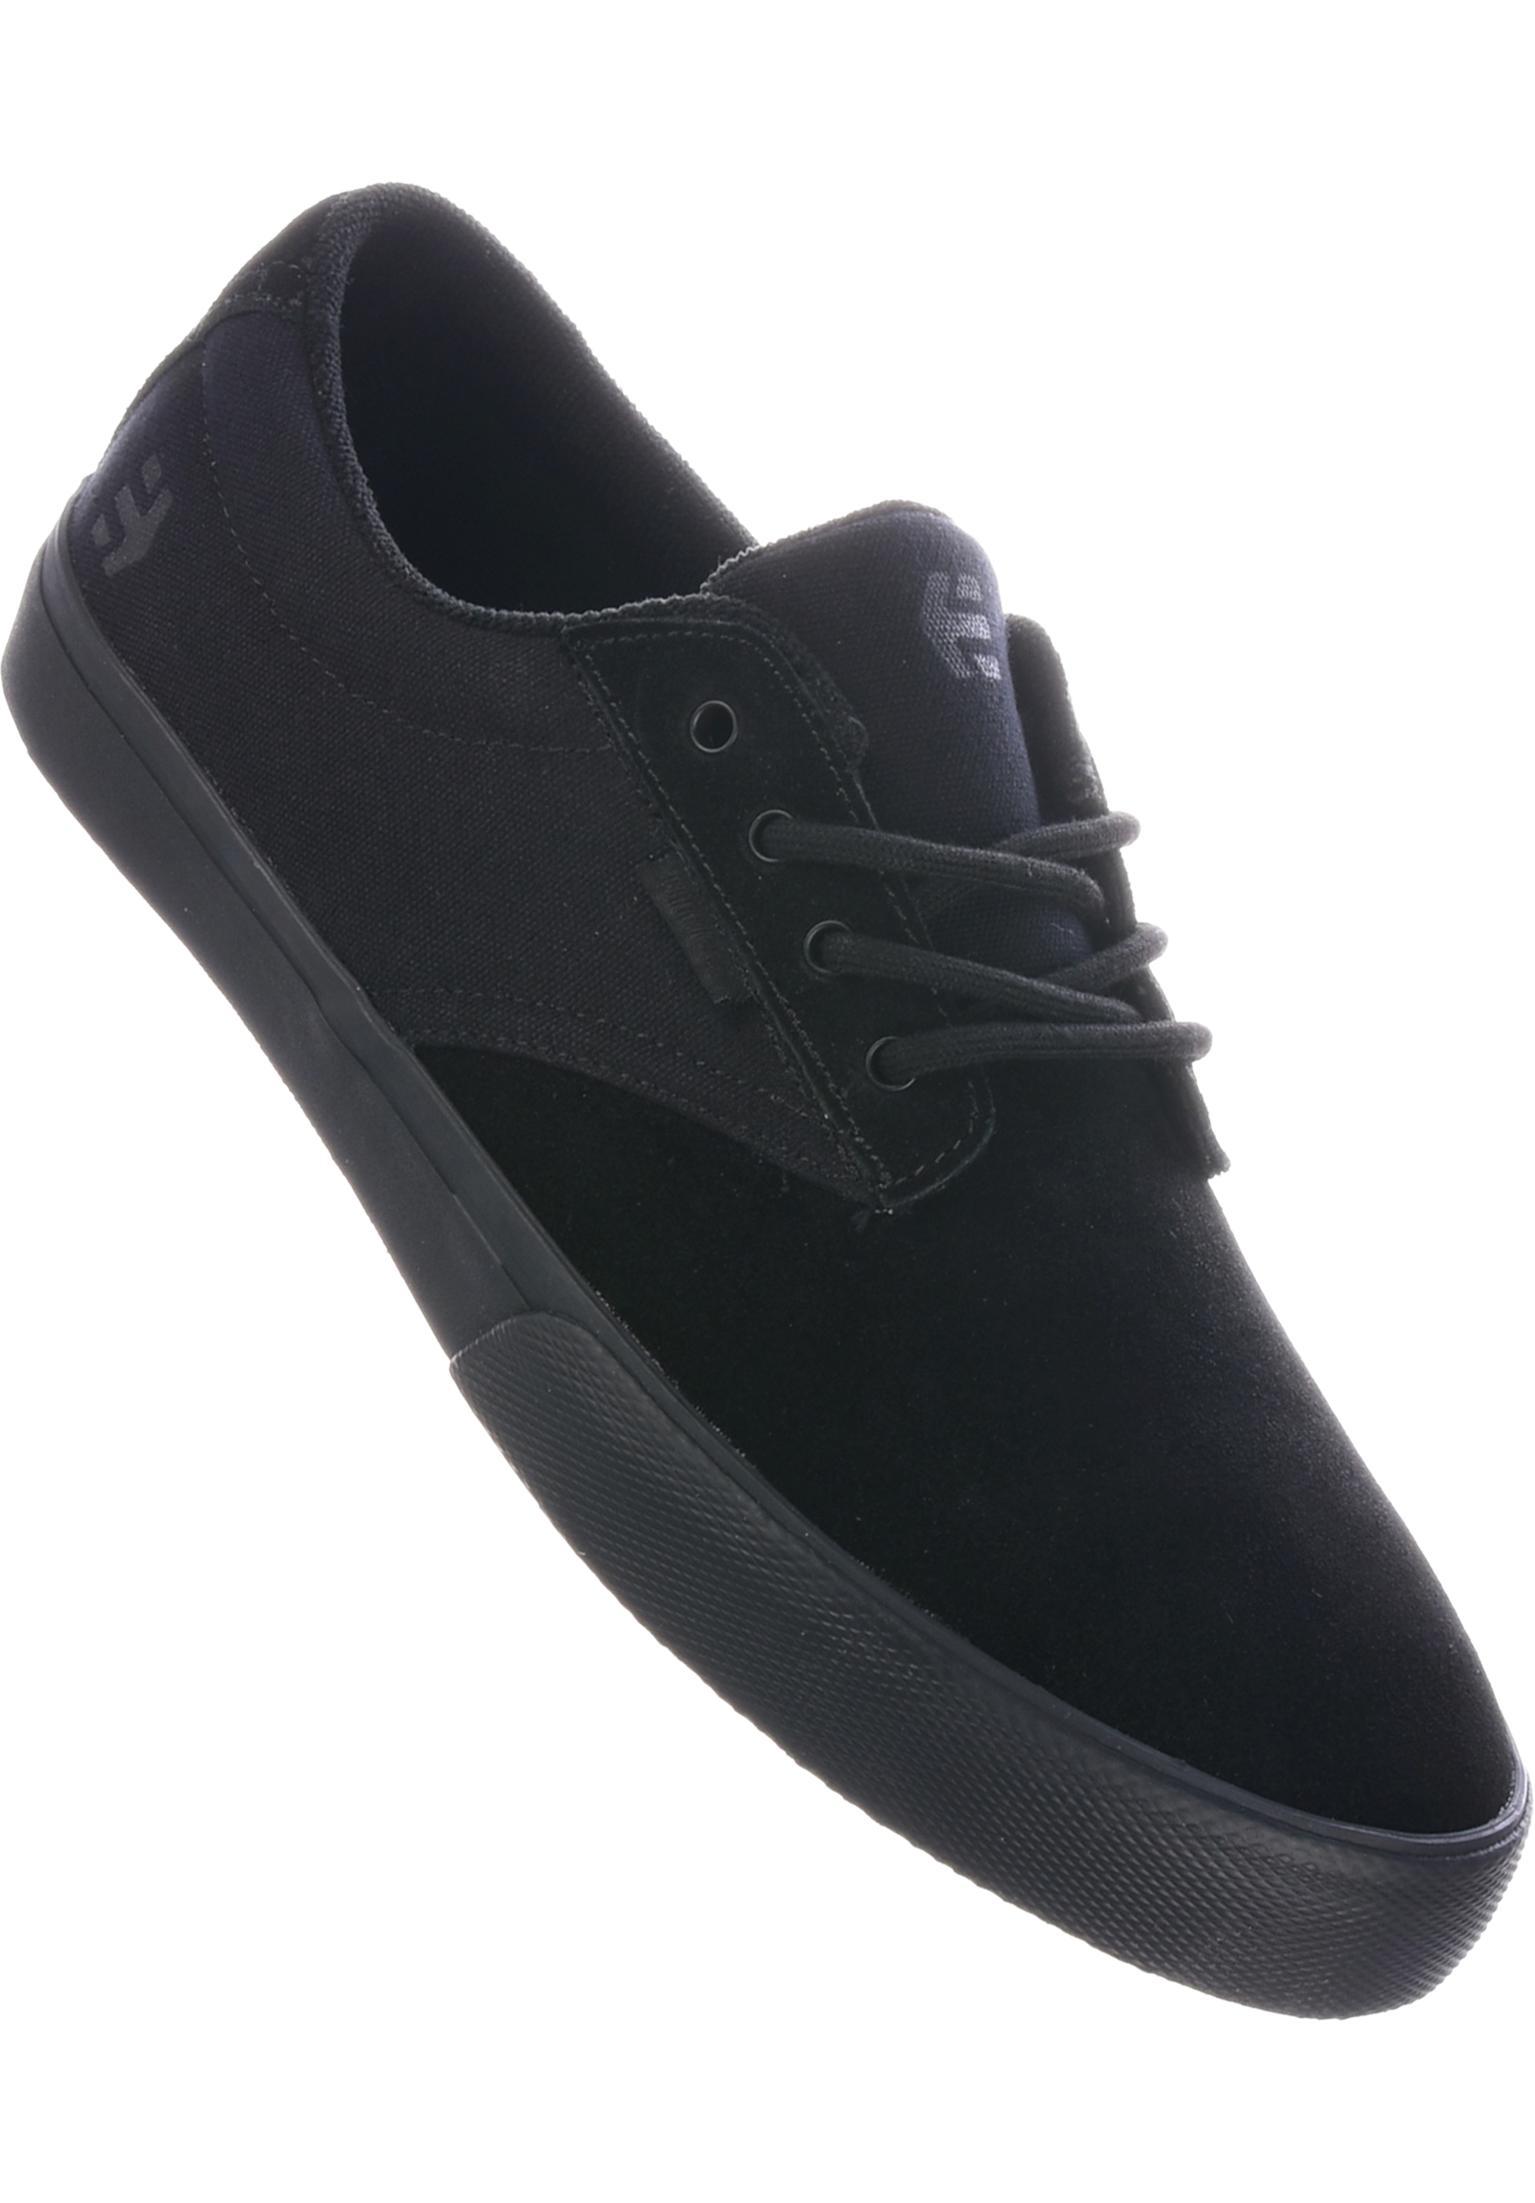 Jameson Vulc etnies All Shoes in black